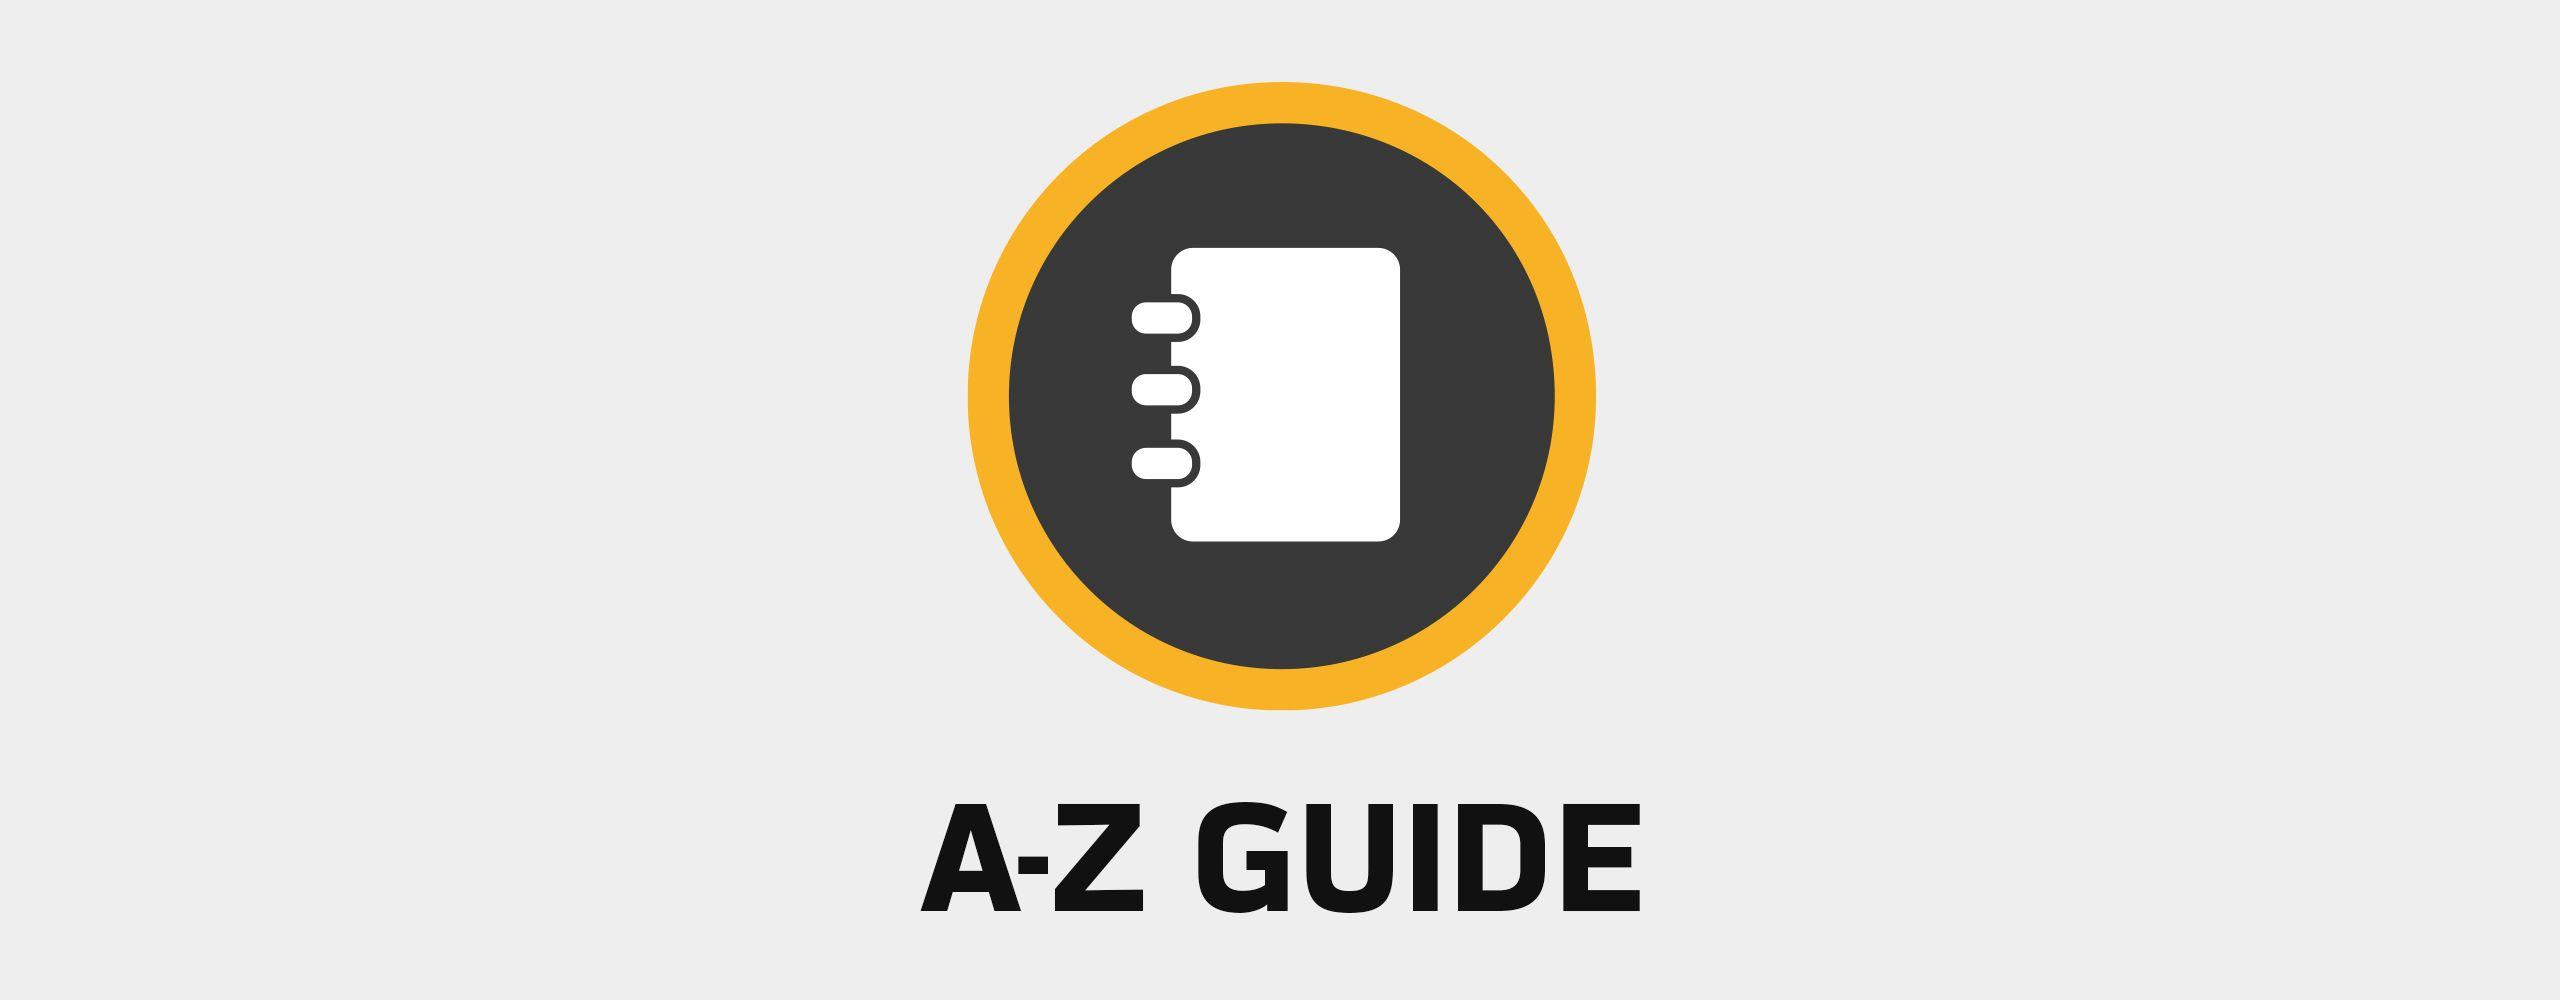 A-ZGuide